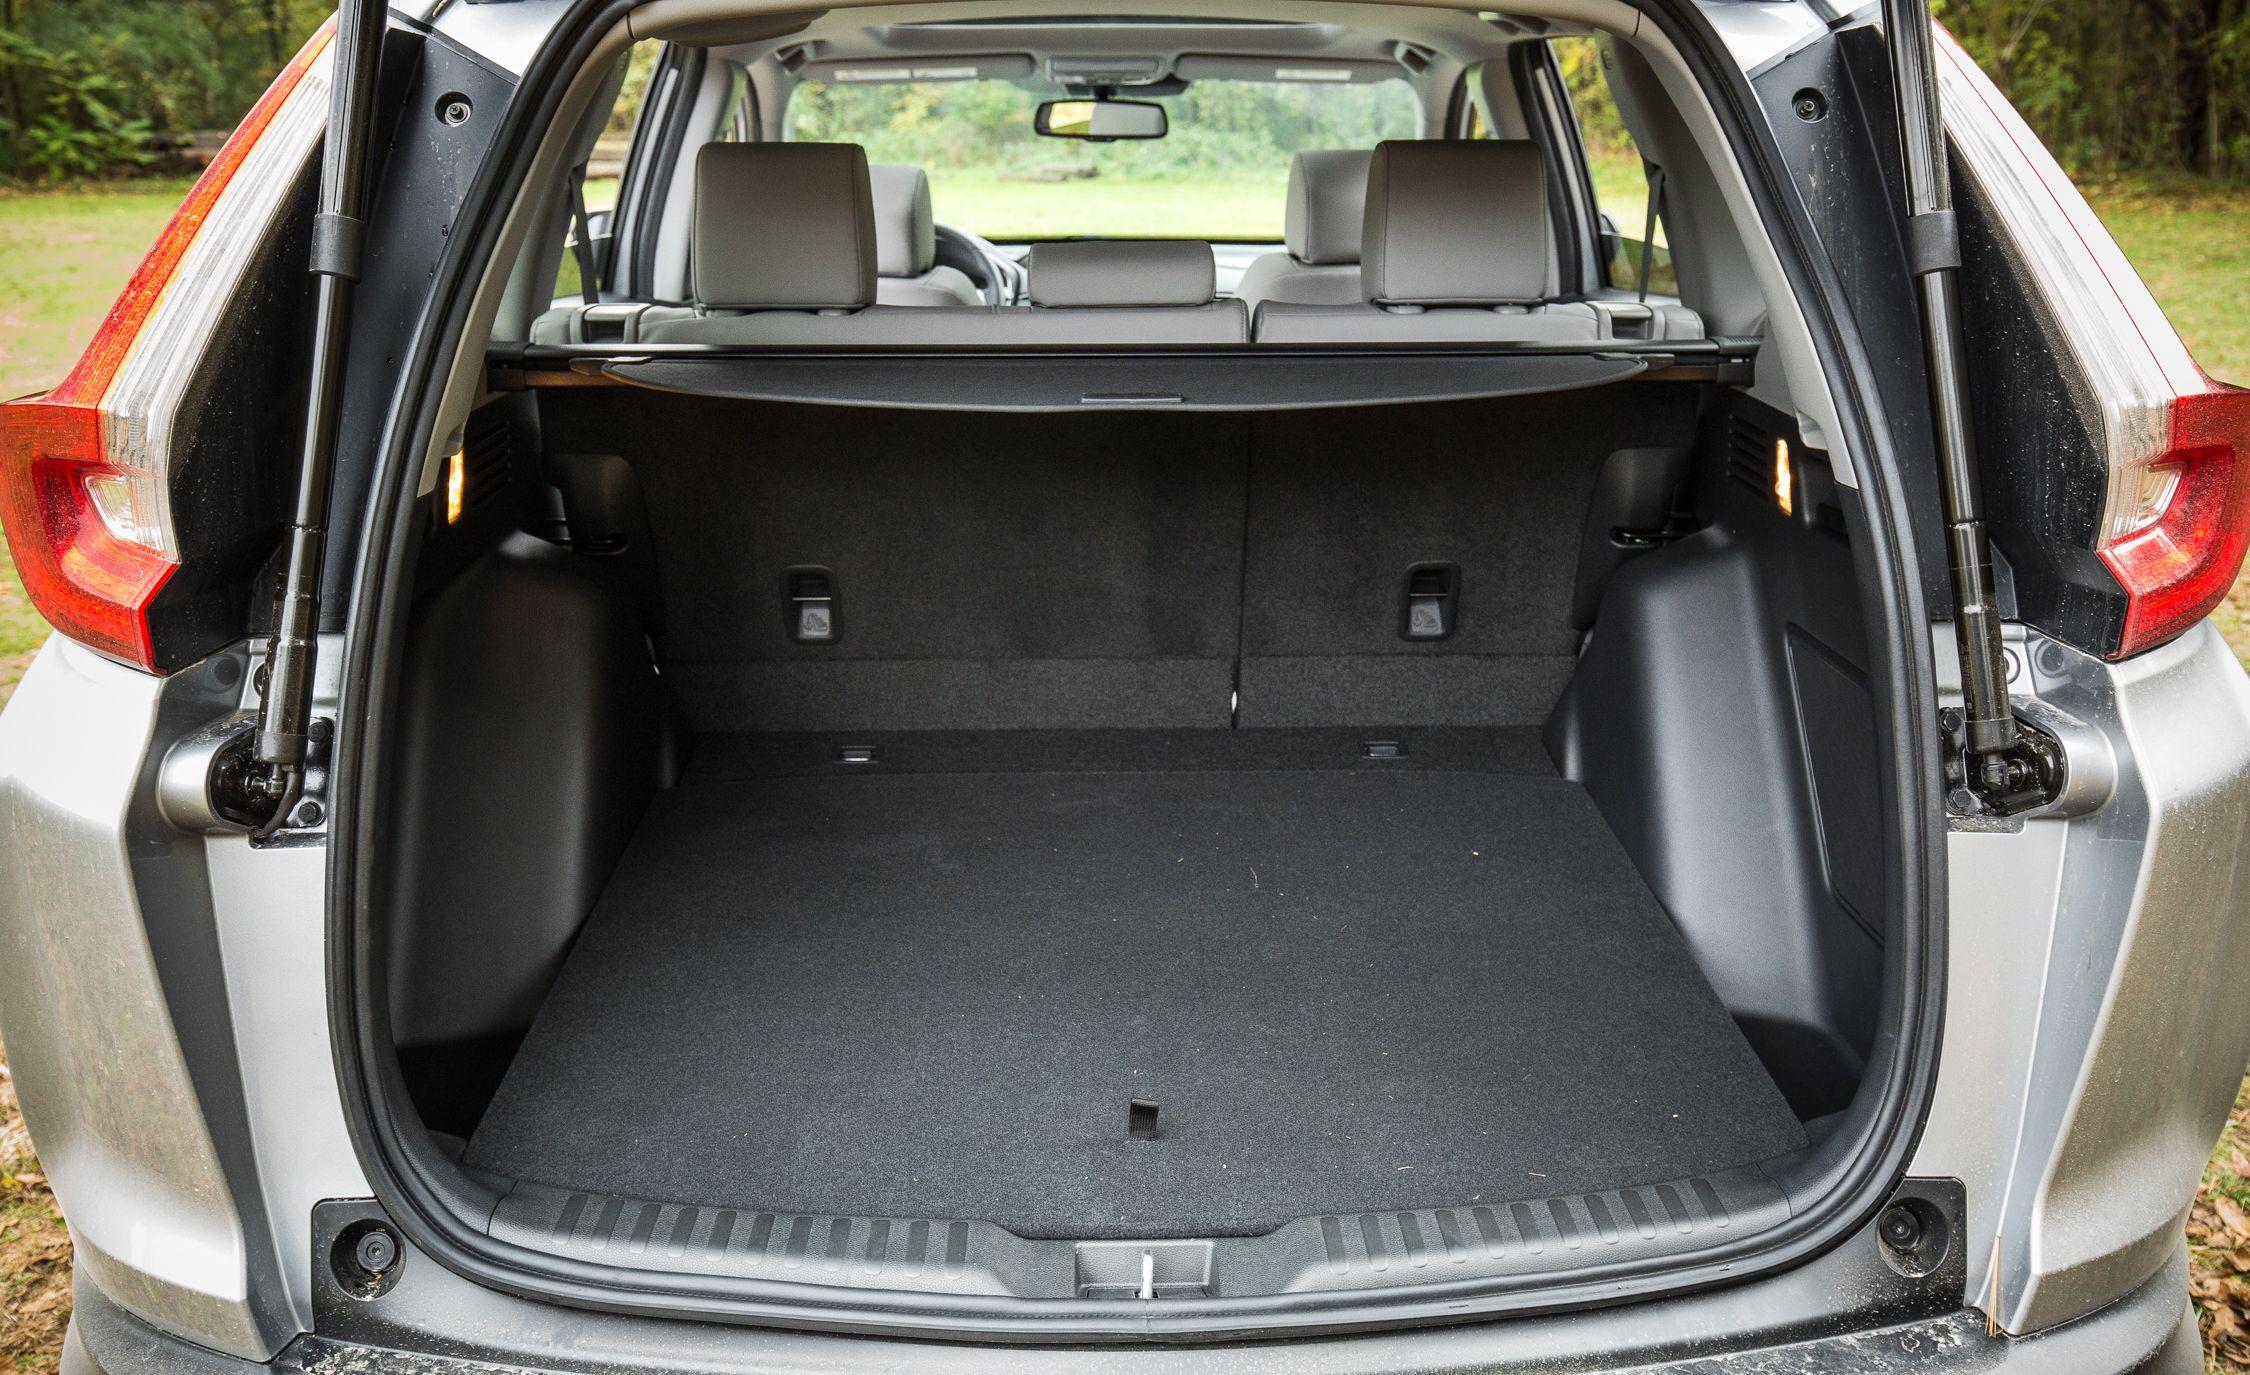 2017 honda cr v cargo space and storage review car and for Honda accord cargo space